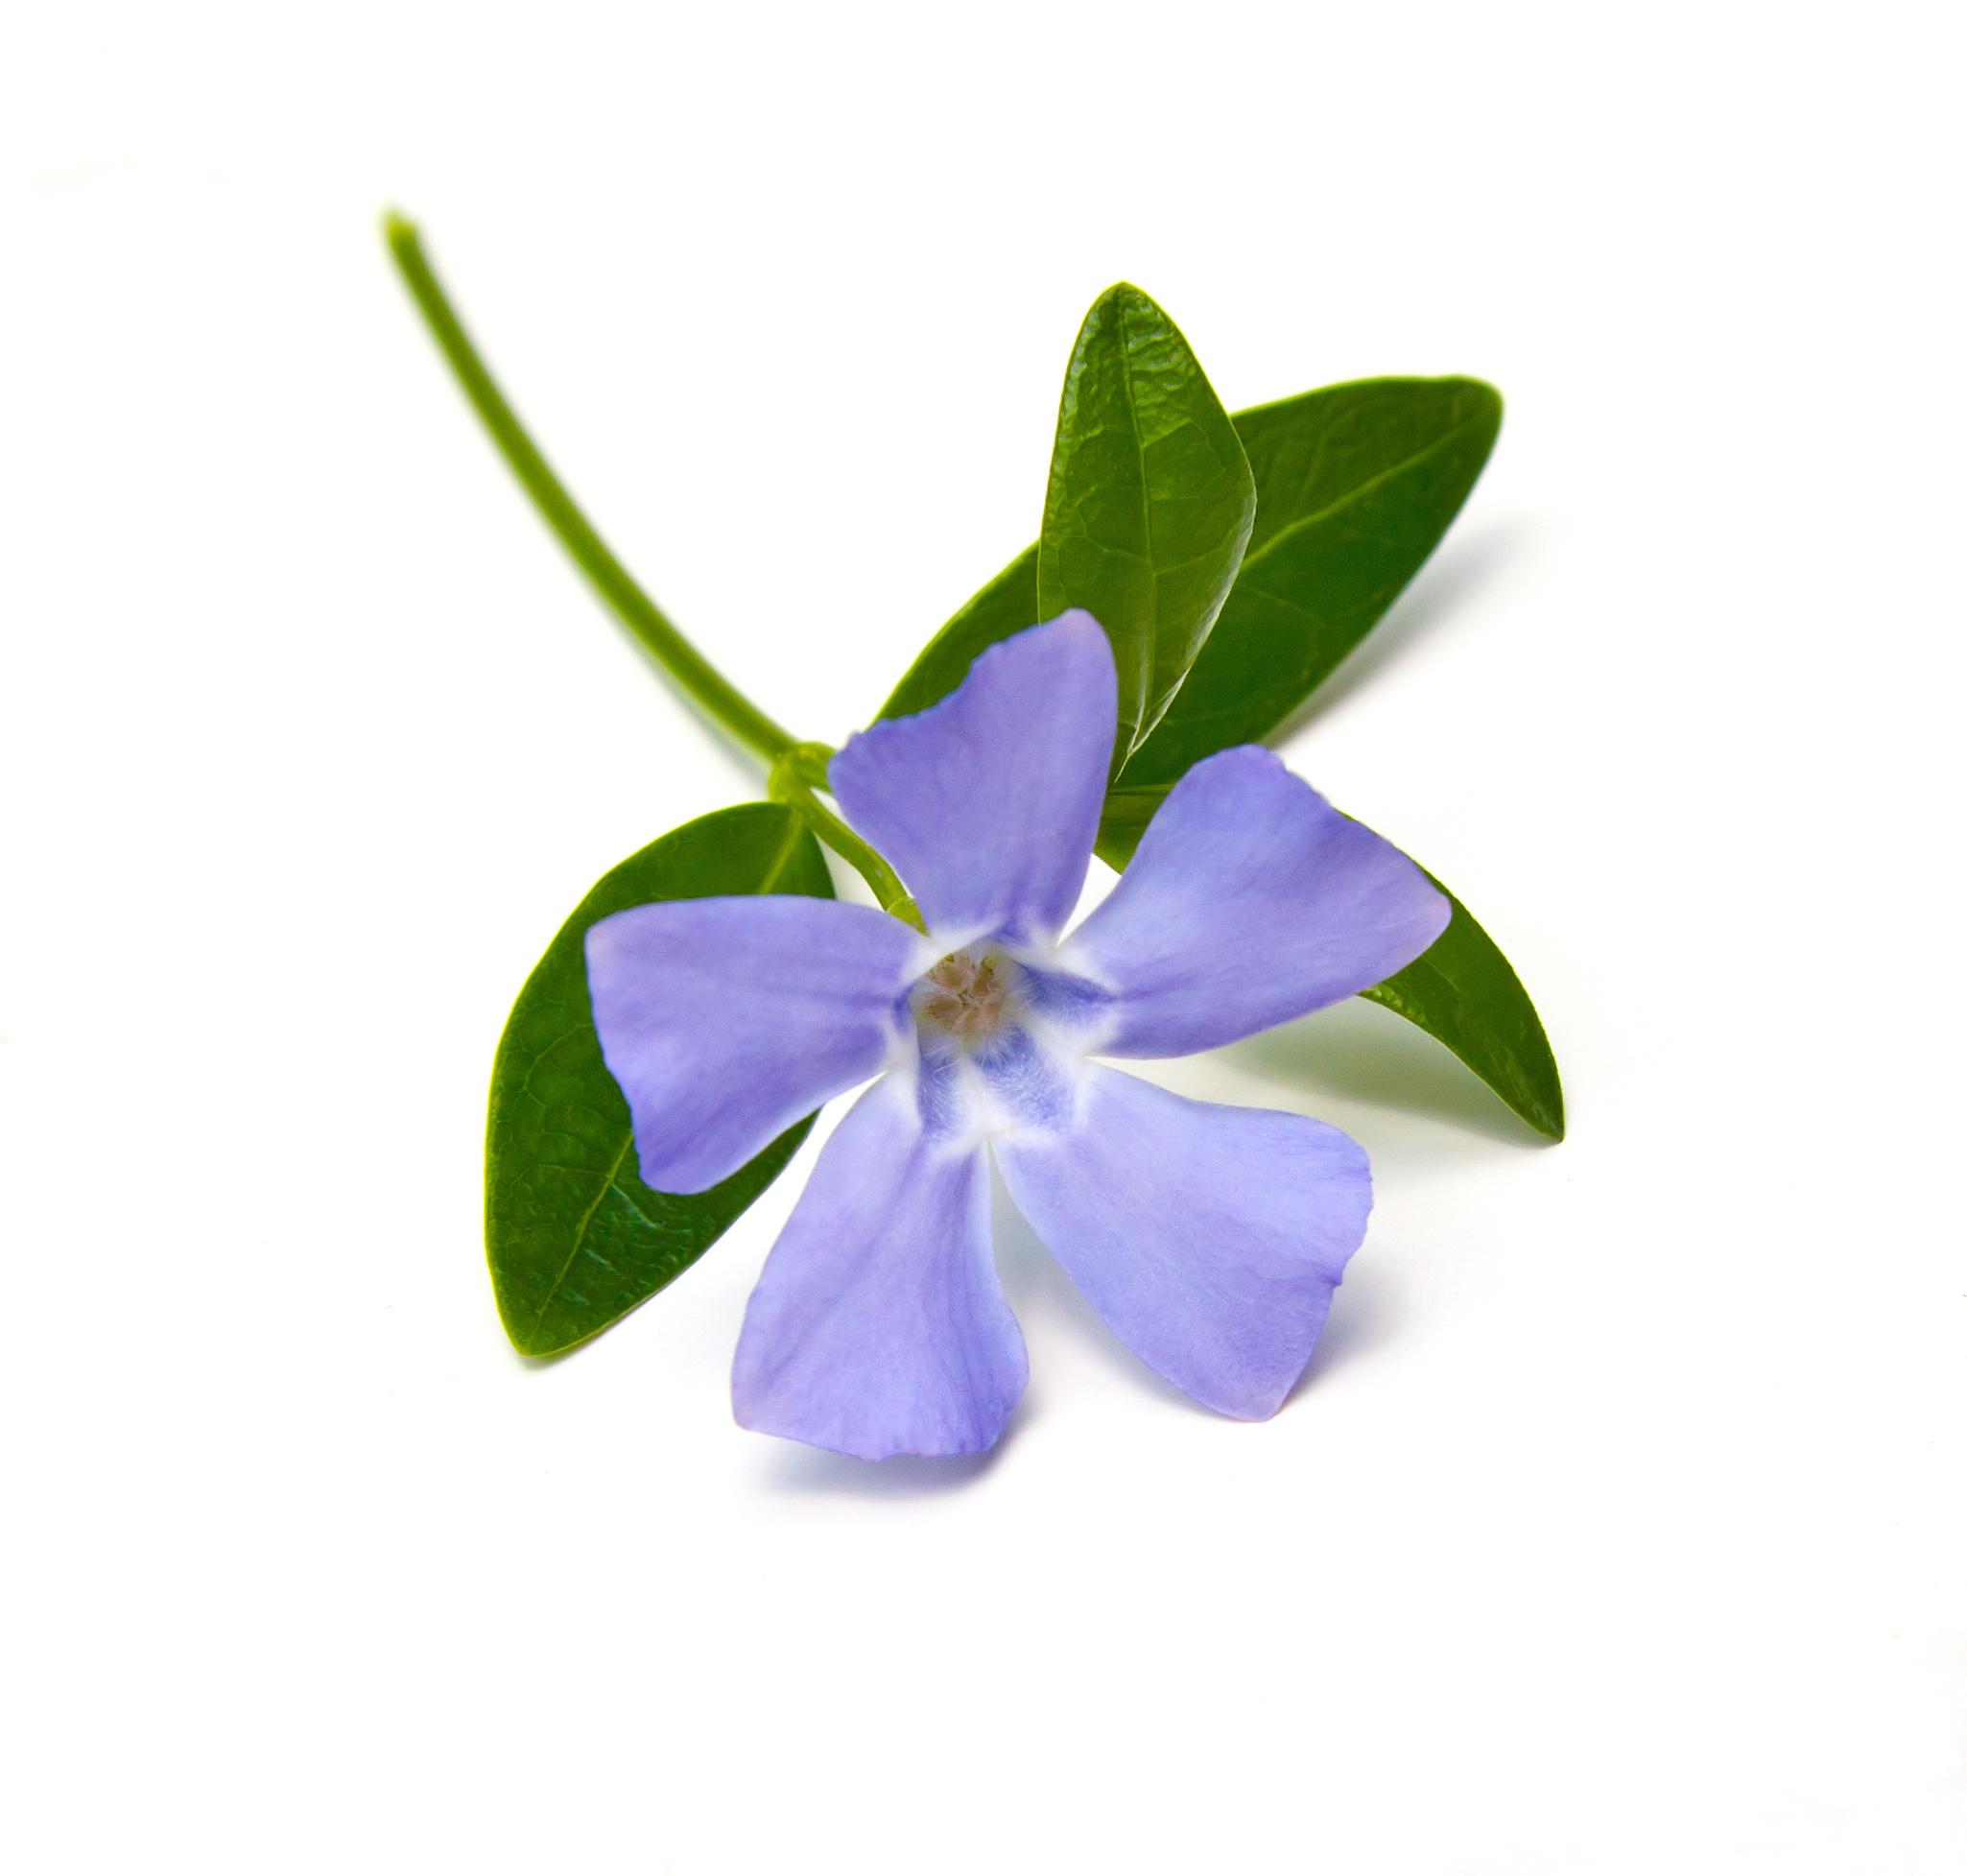 Vinca major flower vinpocetine